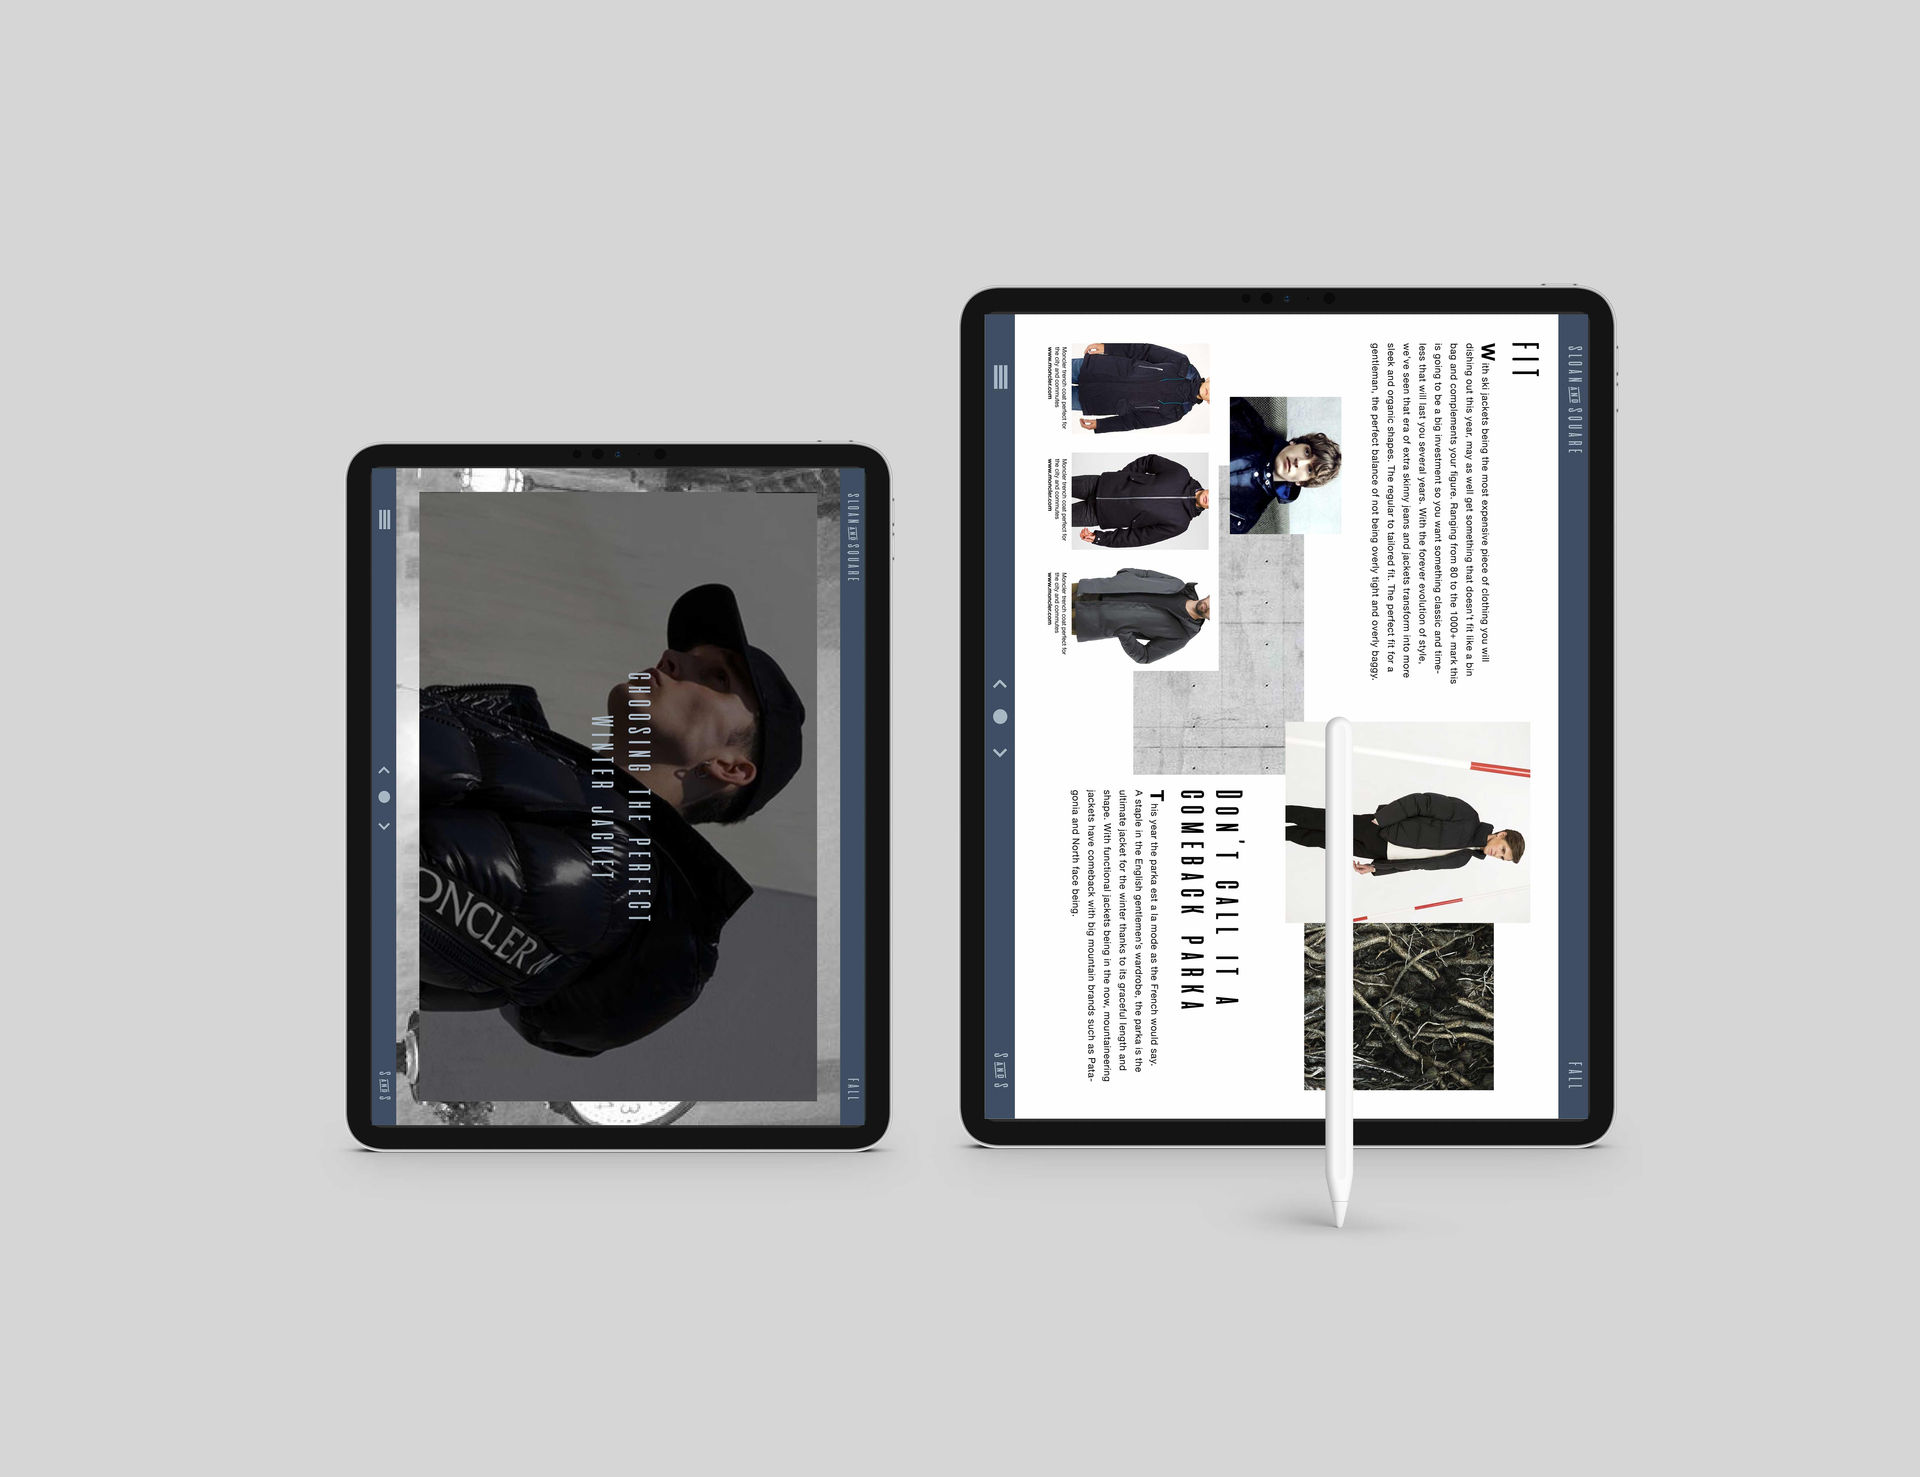 iPad-Pro-Mockup sloan and square.jpg